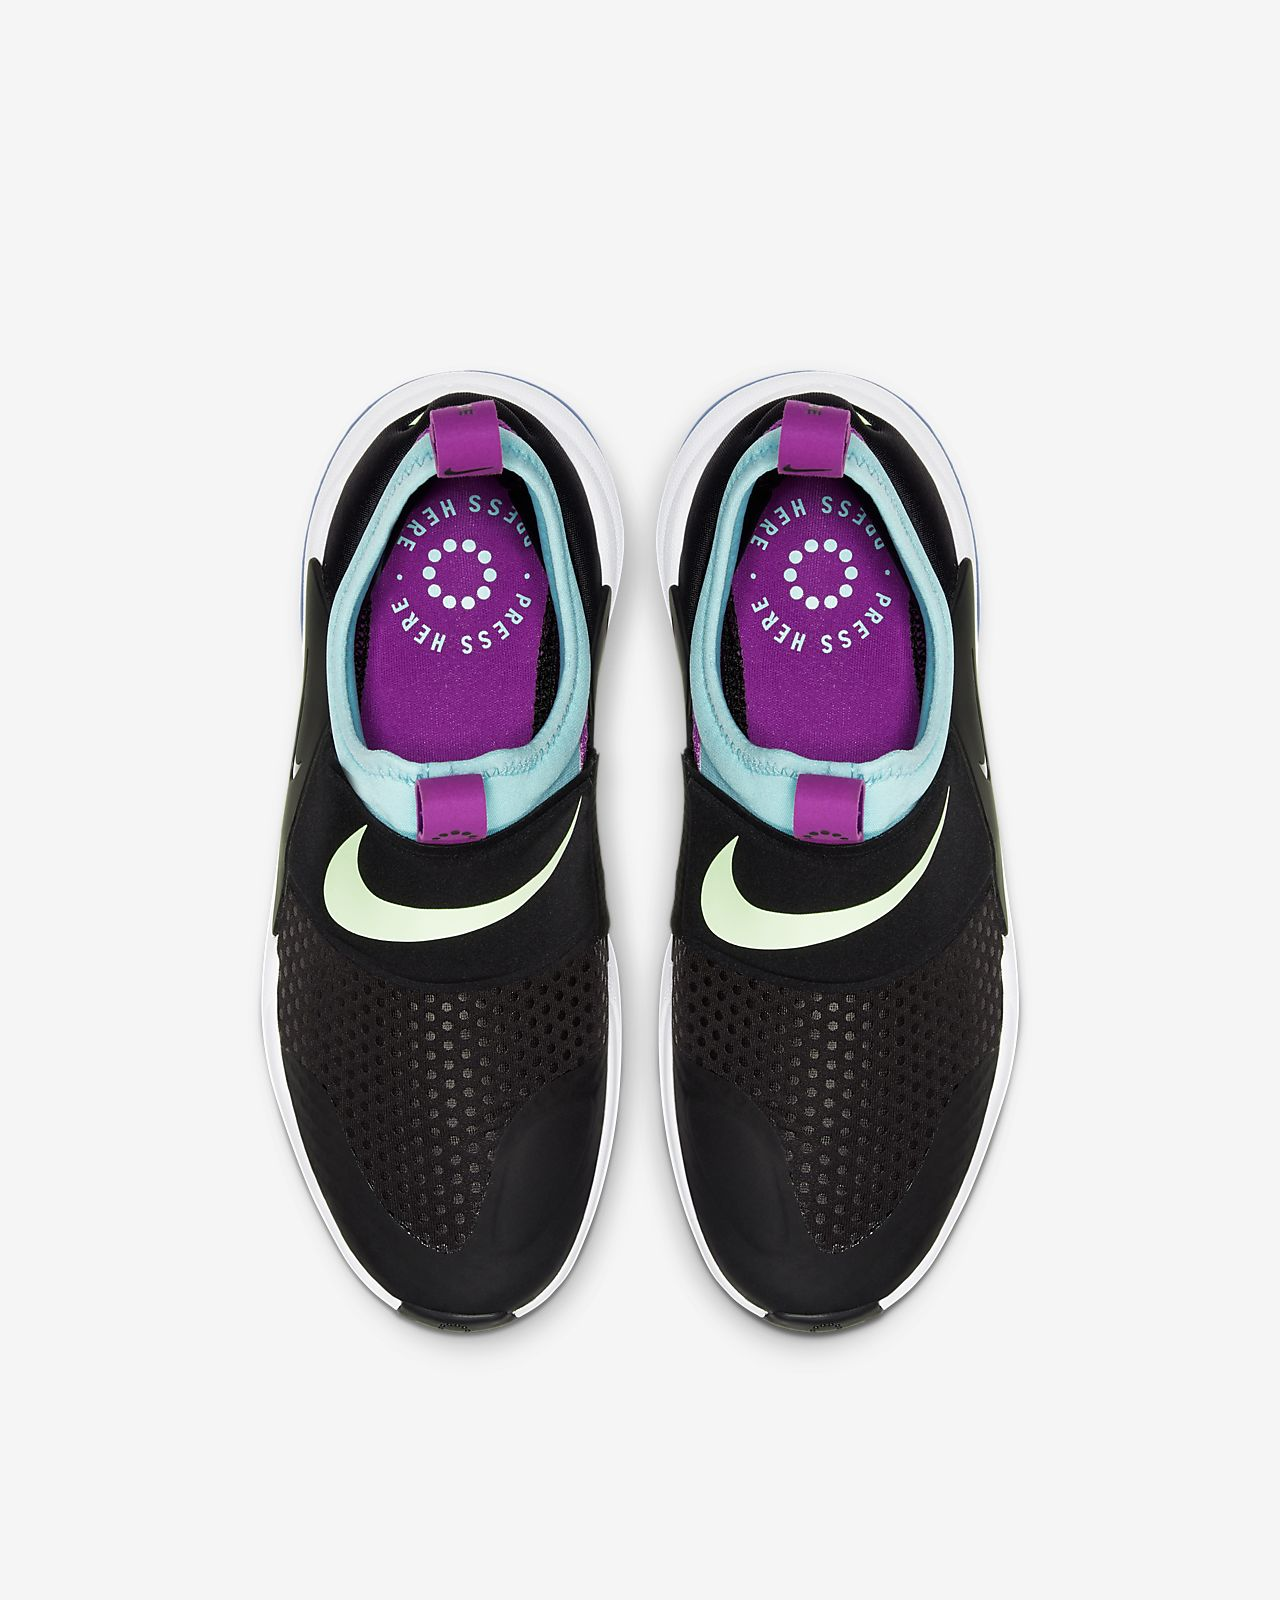 Sko Nike Joyride Nova för barnungdom